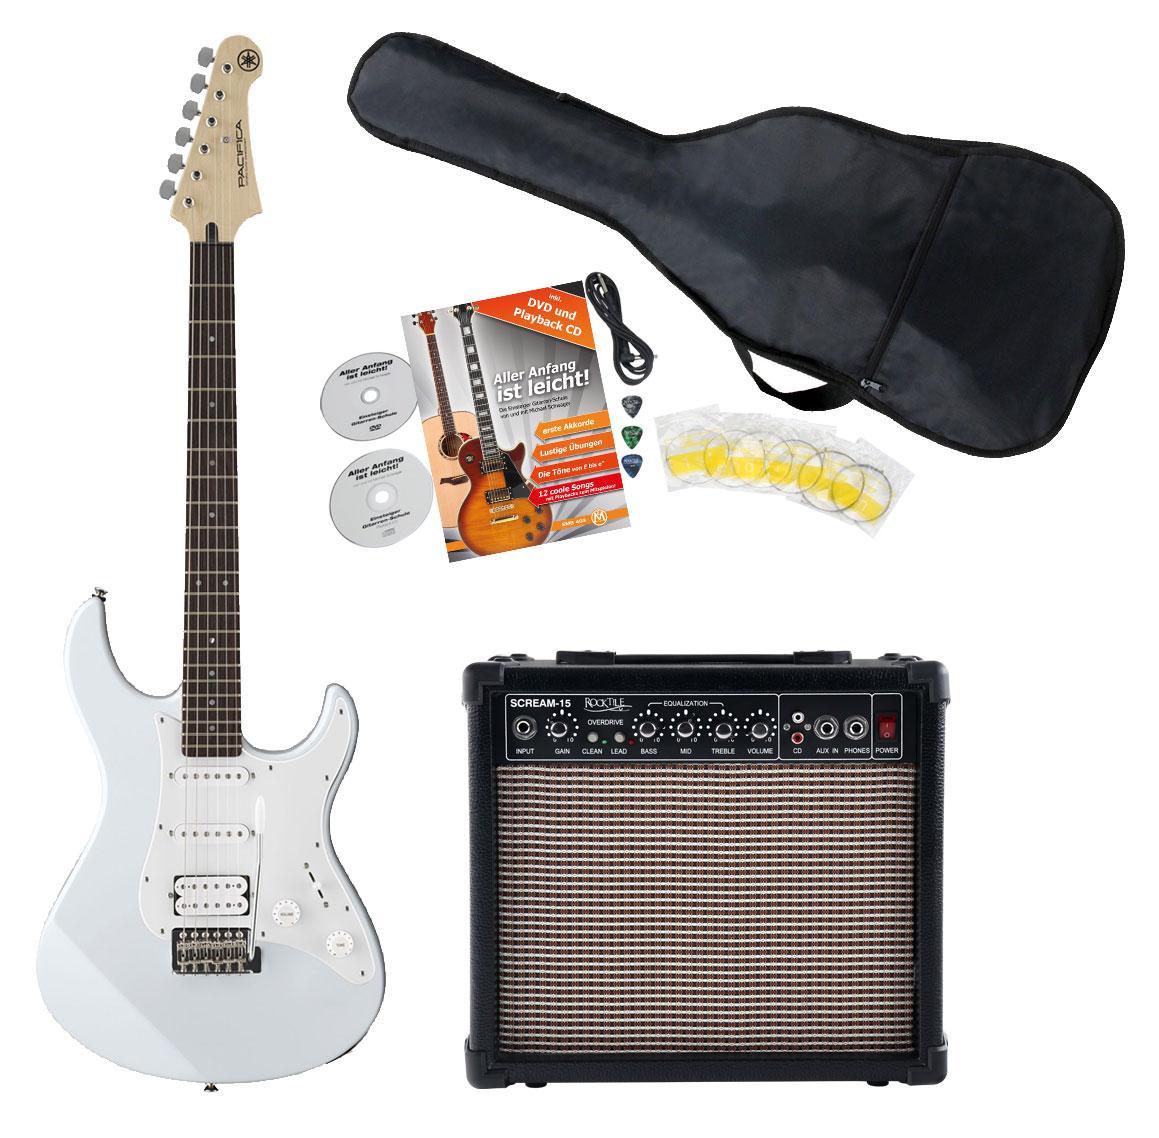 Egitarren - Yamaha Pacifica 012 VW White E Gitarre Starter Set - Onlineshop Musikhaus Kirstein